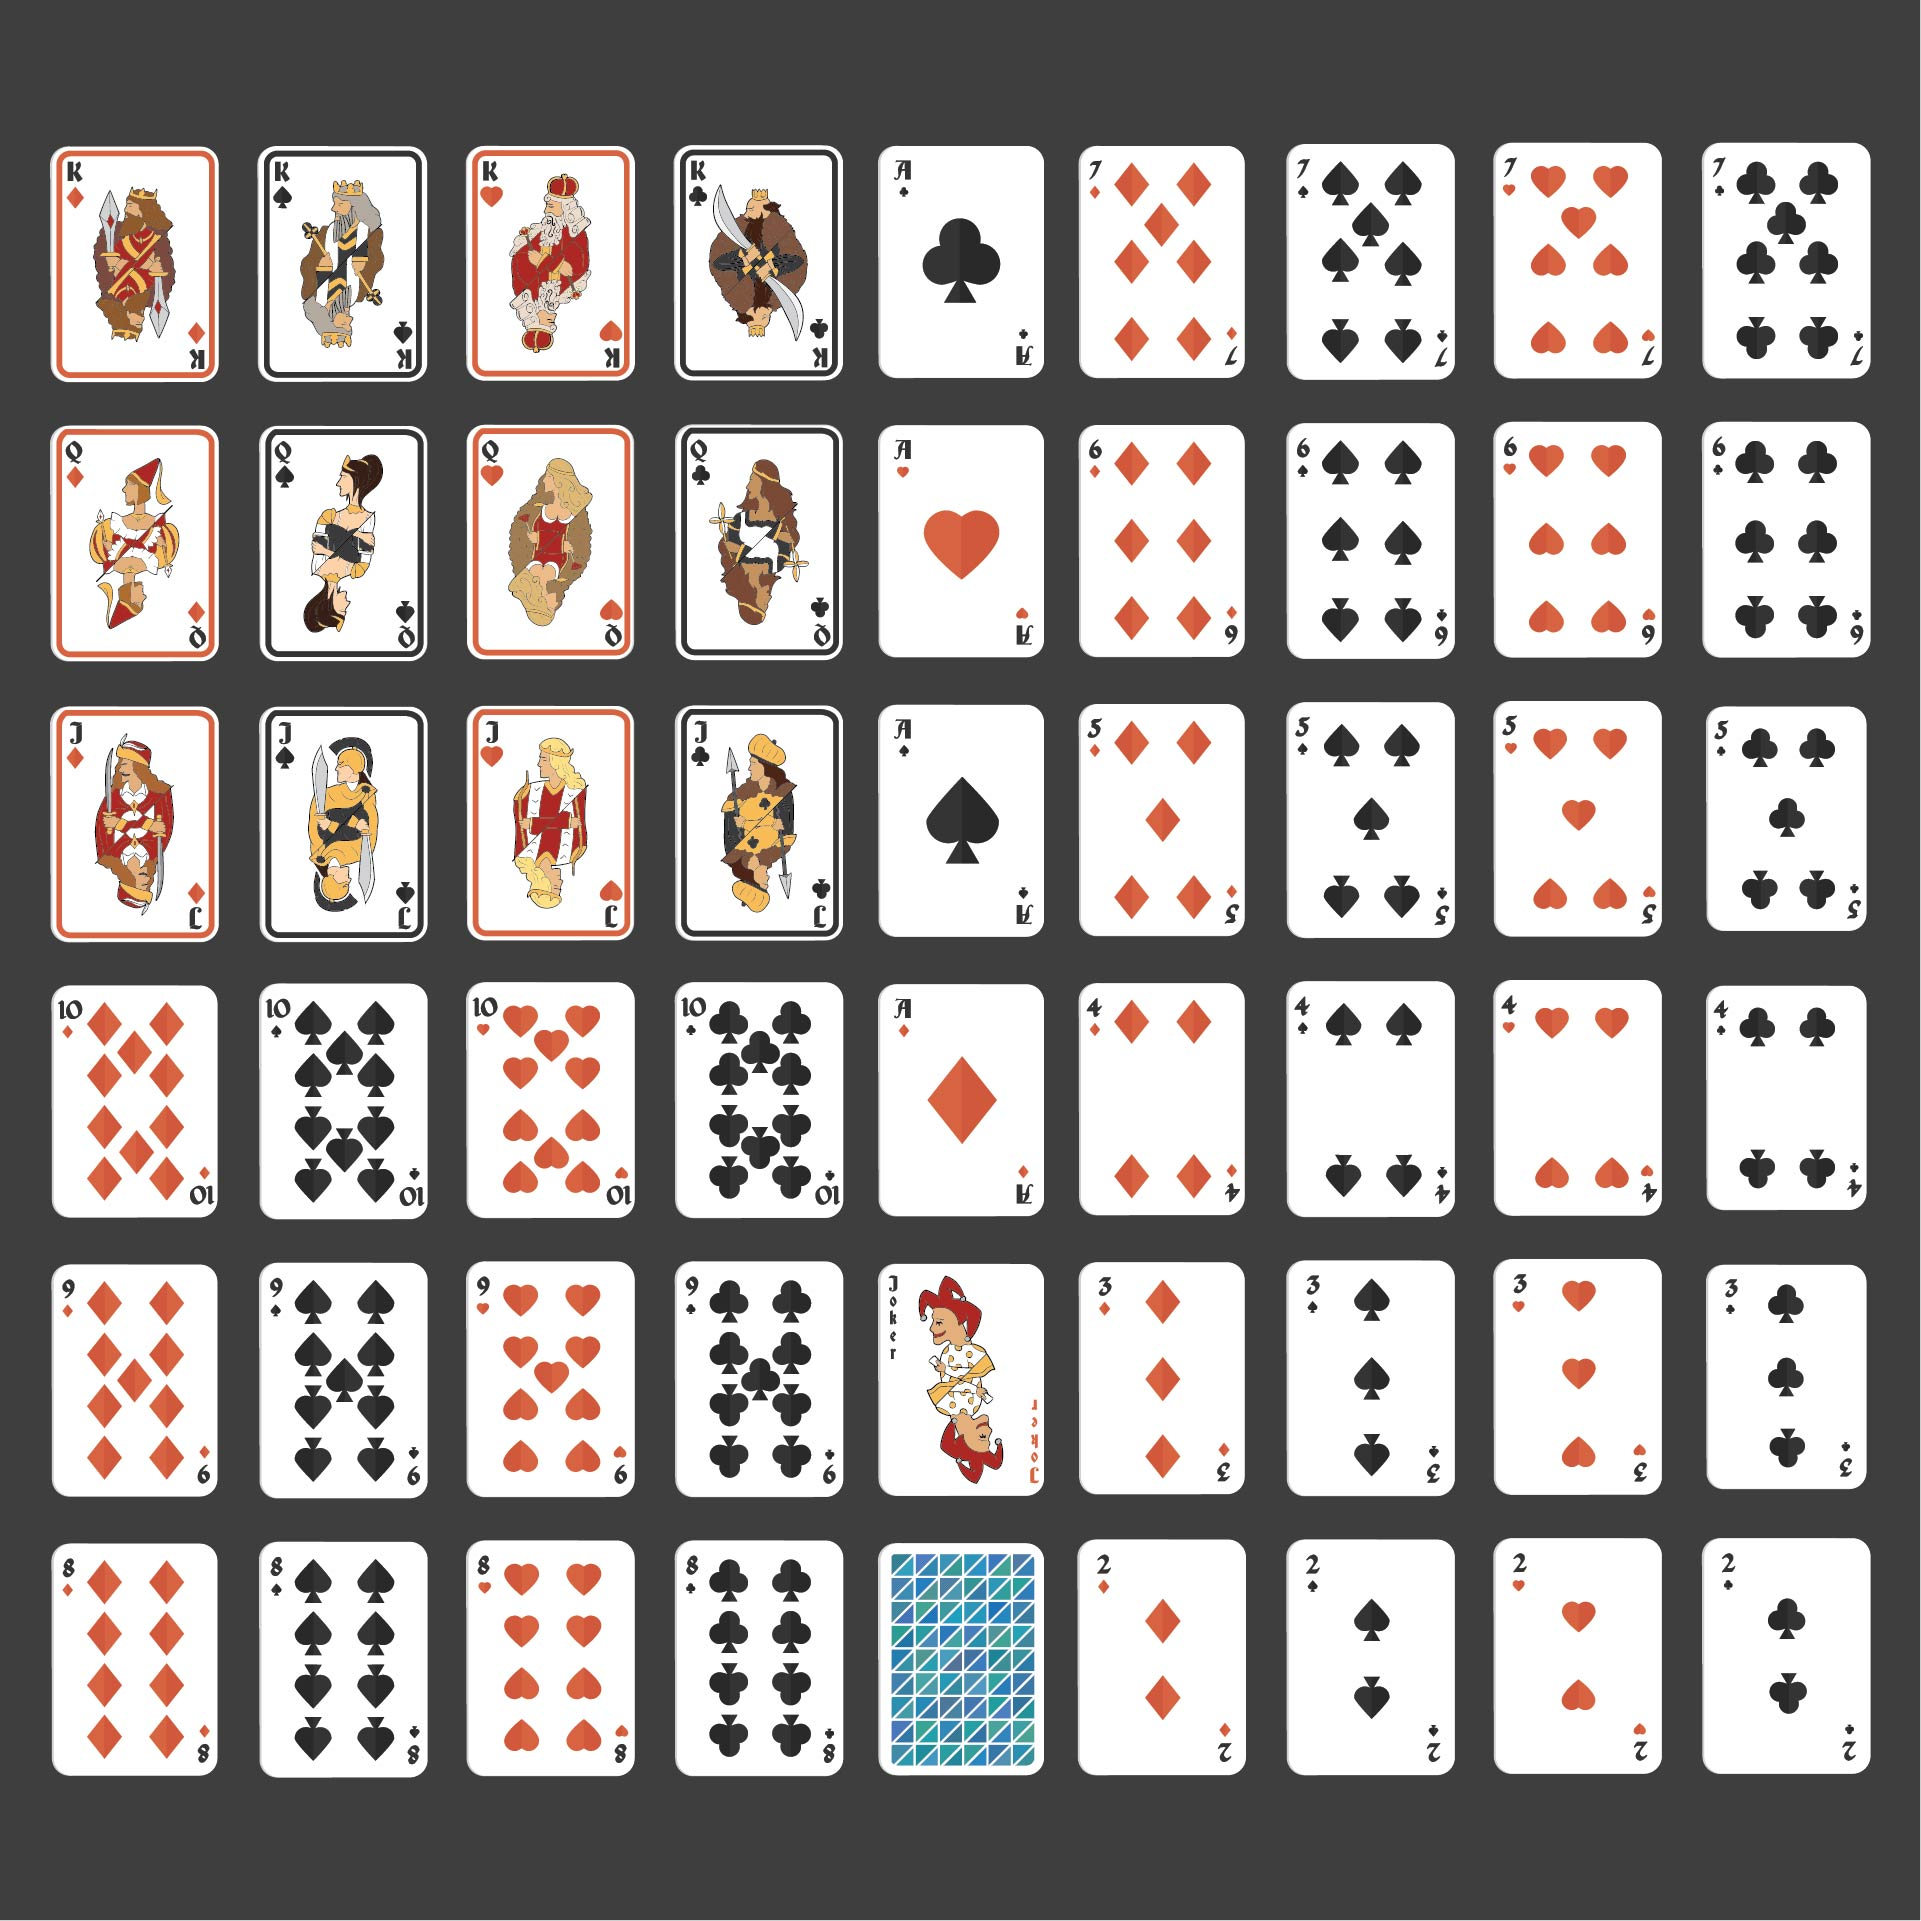 21 Best Deck Of Cards Printable - printablee.com Inside Deck Of Cards Template